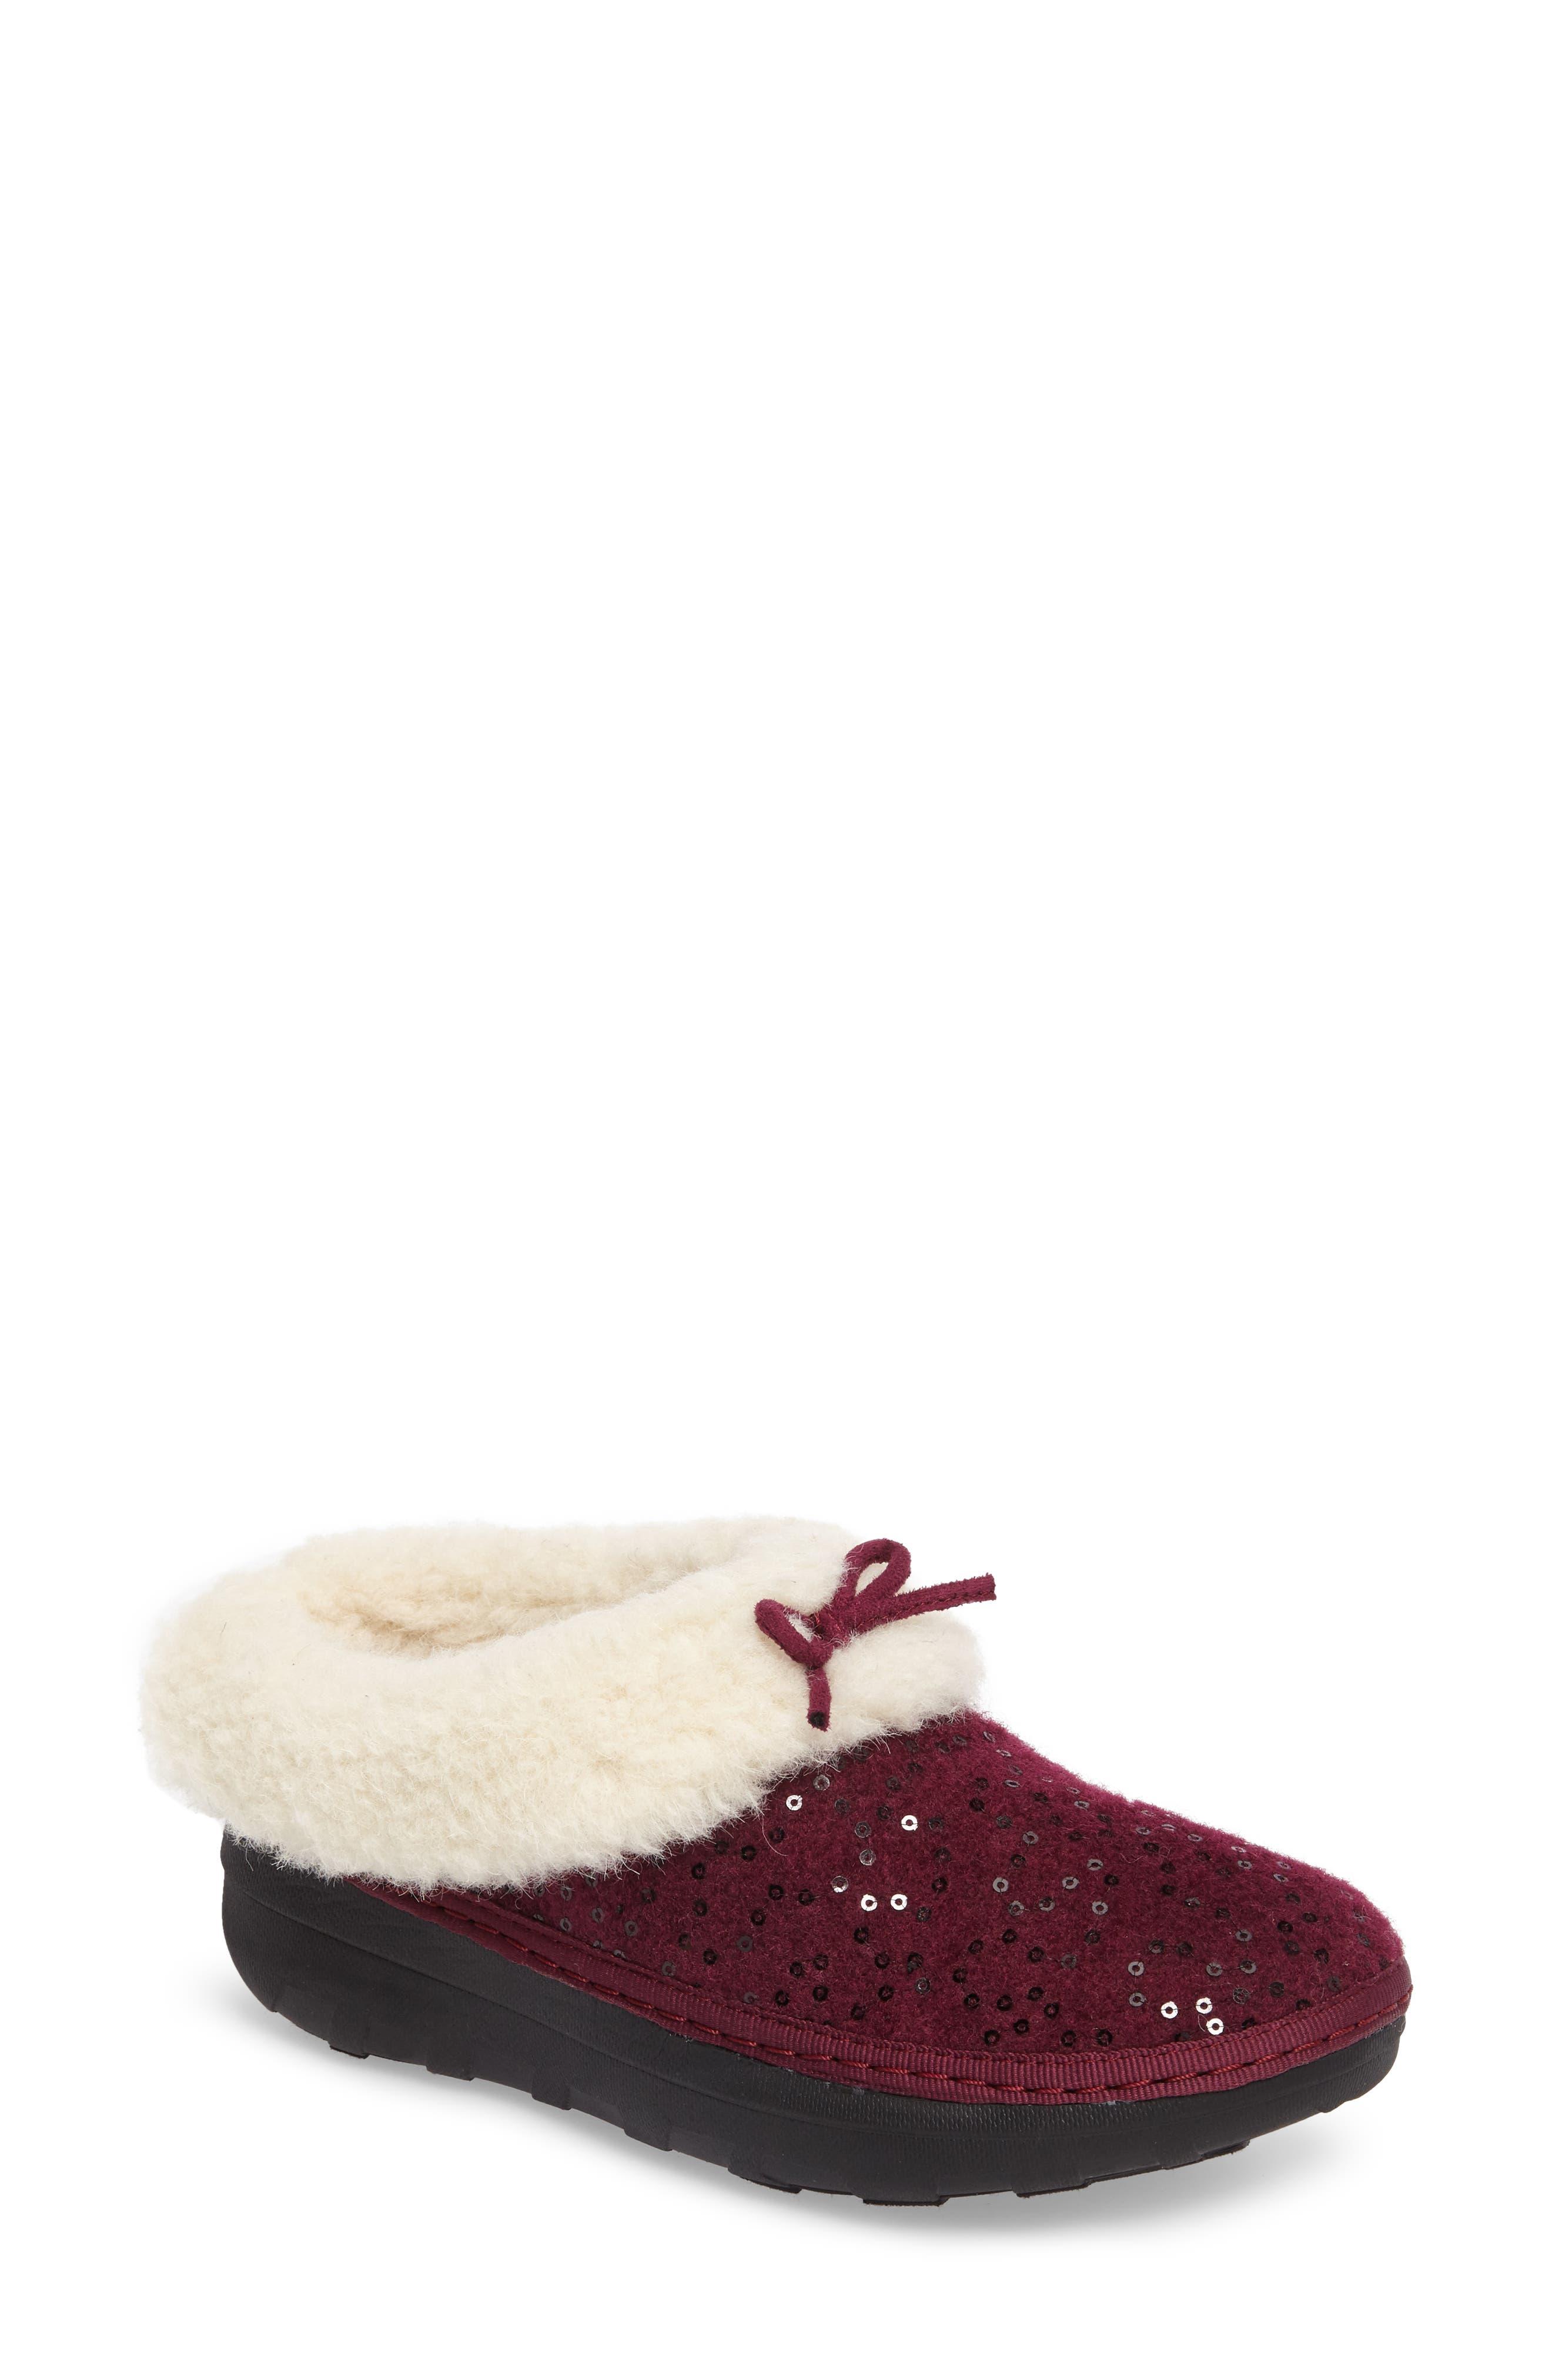 Loaff Snug Sequin Slipper,                         Main,                         color, Deep Plum